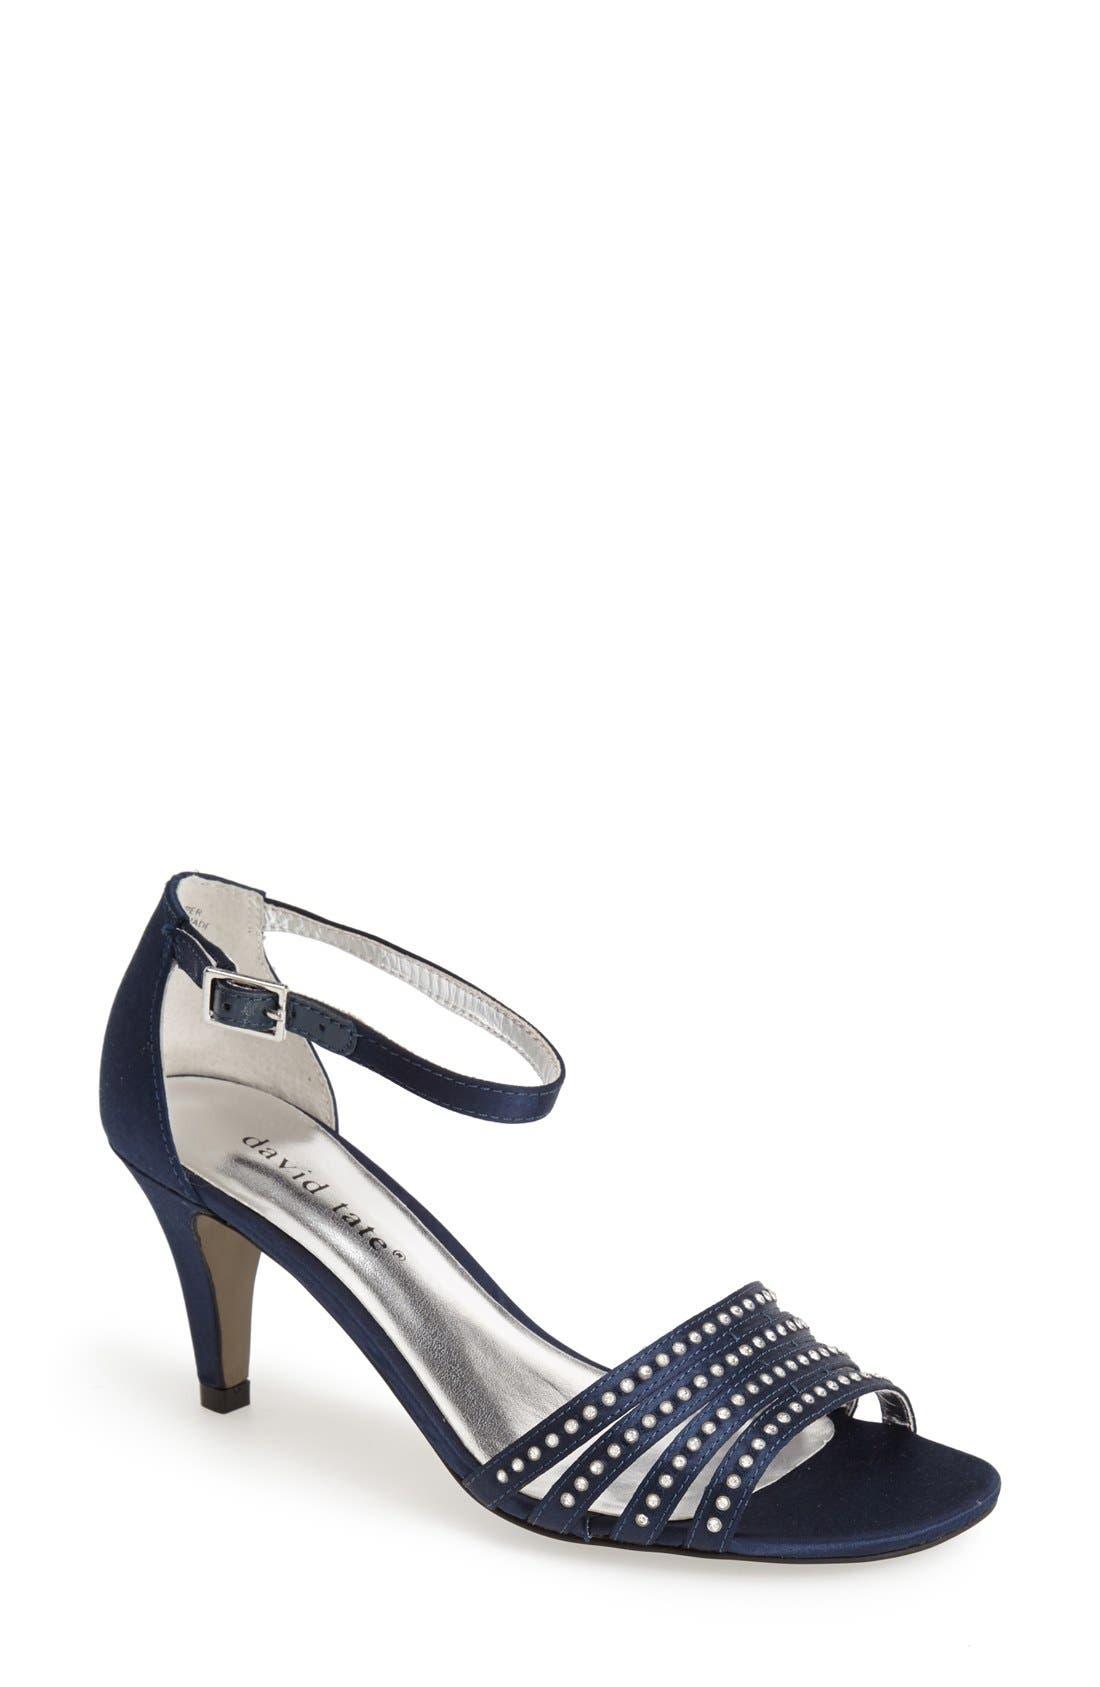 Main Image - David Tate 'Terra' Ankle Strap Sandal (Women)